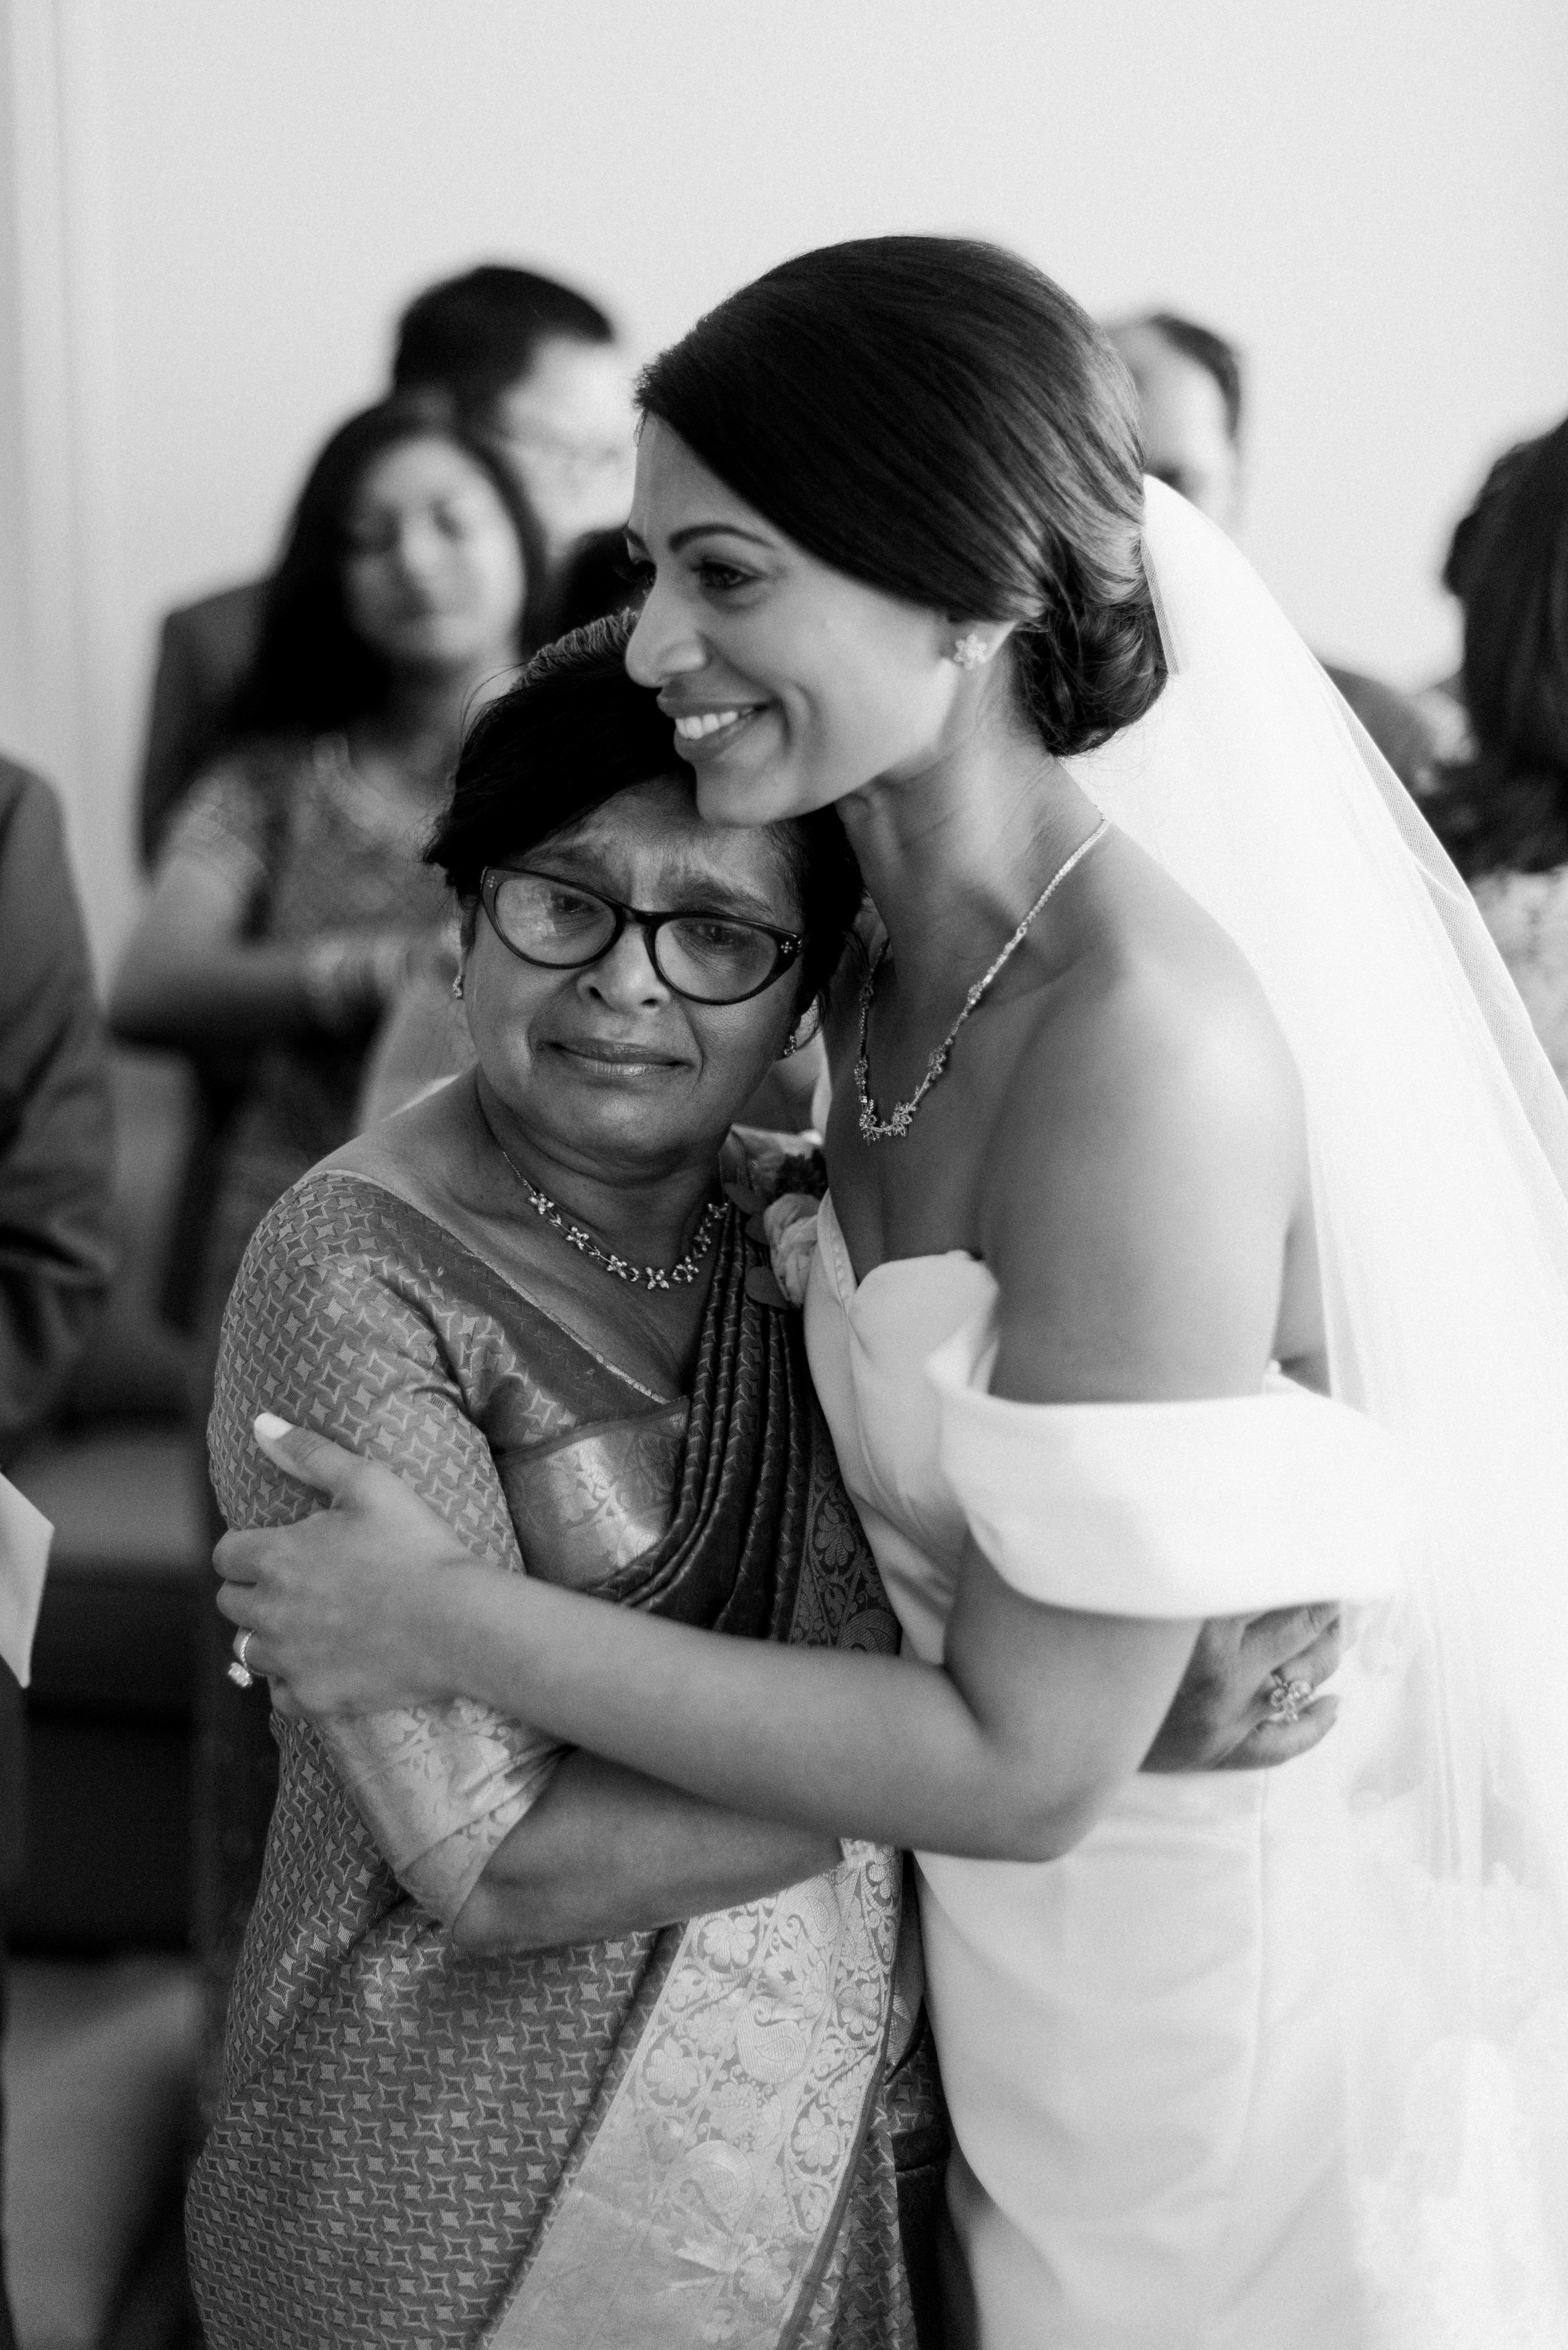 Fine-Art-Film-Houston-Wedding-Photographer-Best-Top-Luxury-Texas-Austin-Dallas-Destination-Dana-Fernandez-Photography-The-Bell-Tower-on-34th-Indian-7.jpg